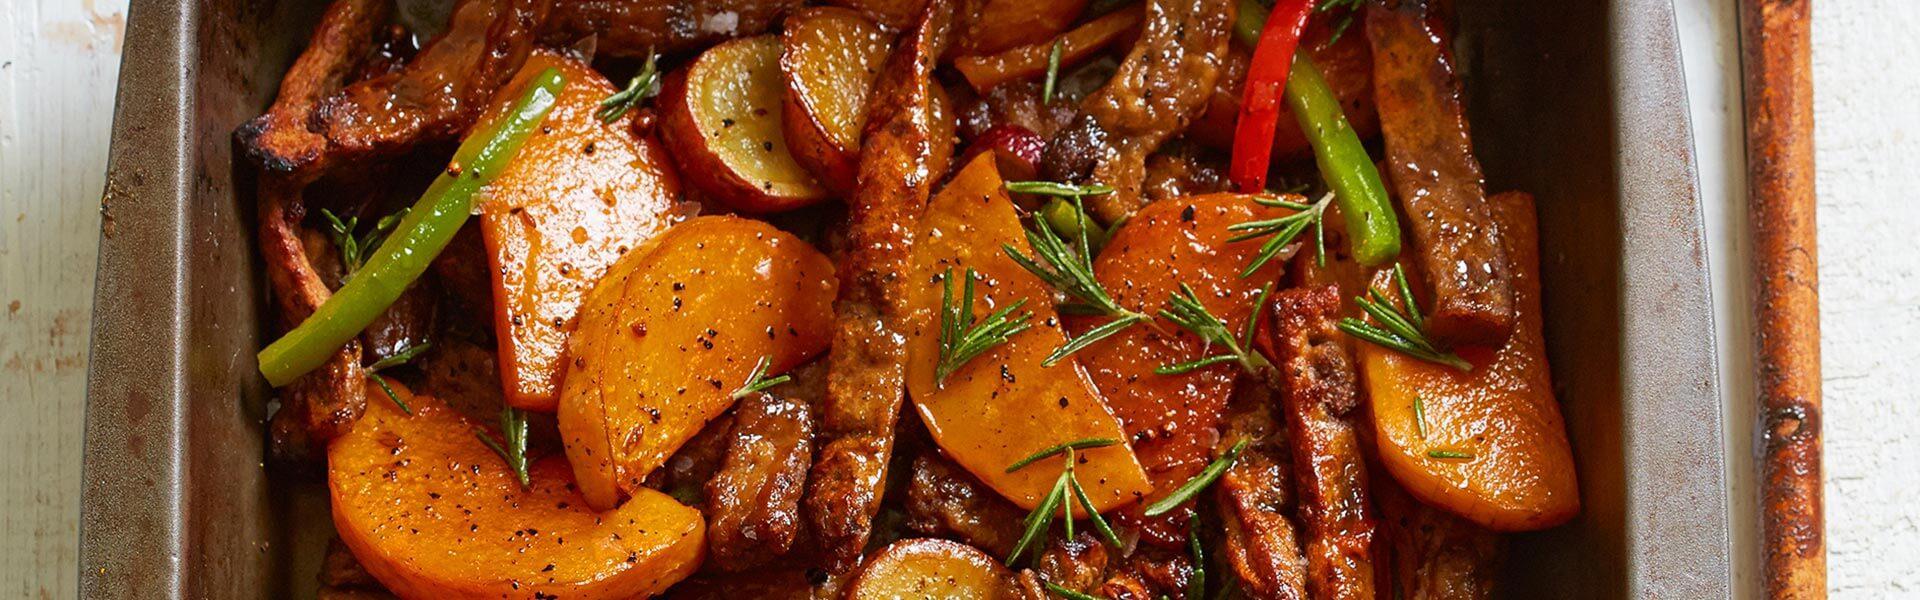 Warm Butternut and Sweet Potato Salad 2019